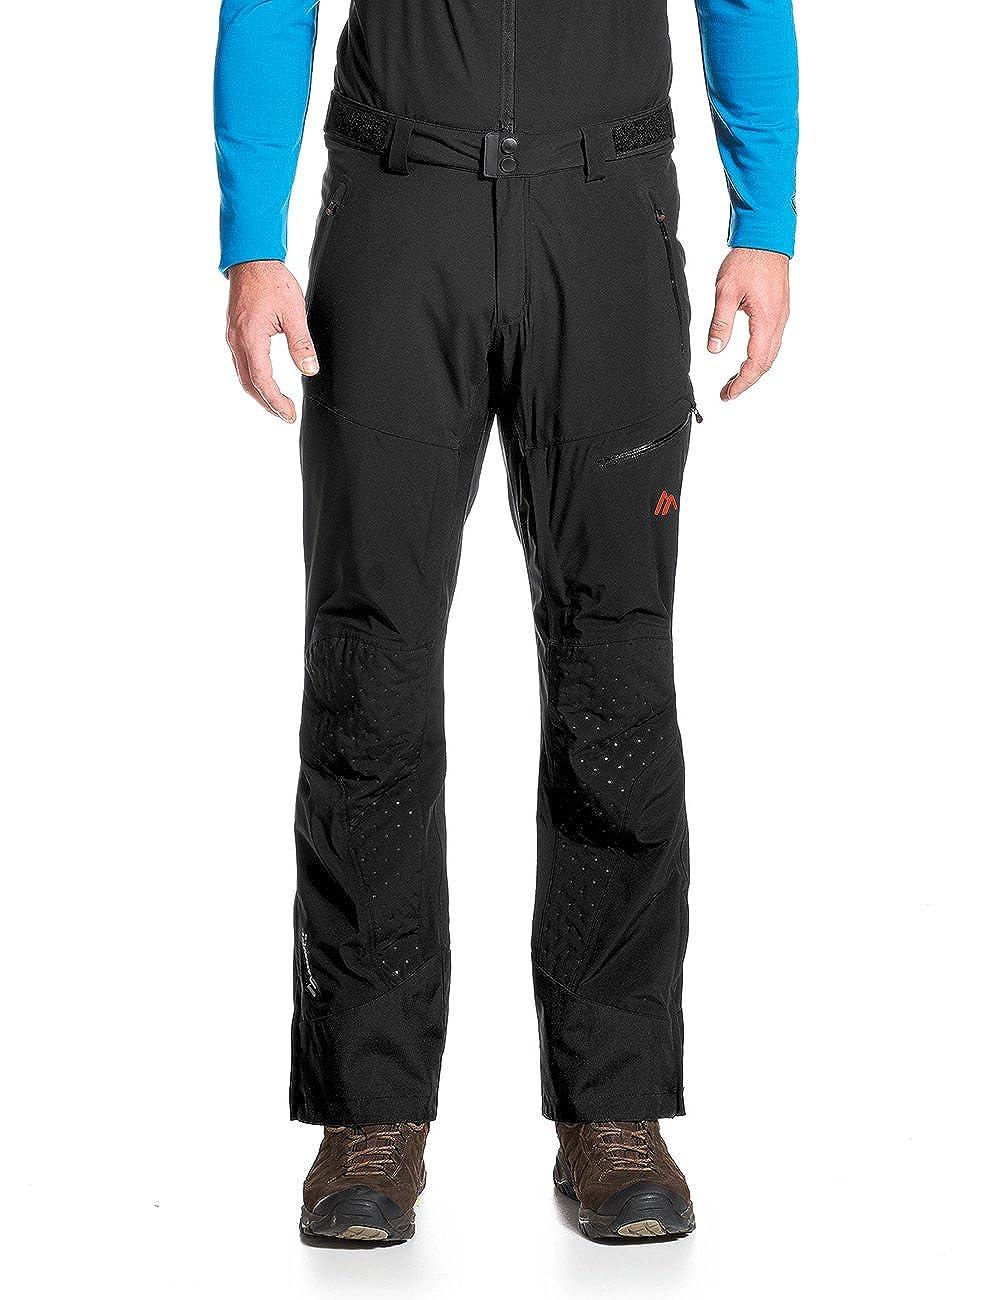 De Ski Sports NoukousBlack62 Pantalon Maier UpMVGqSz